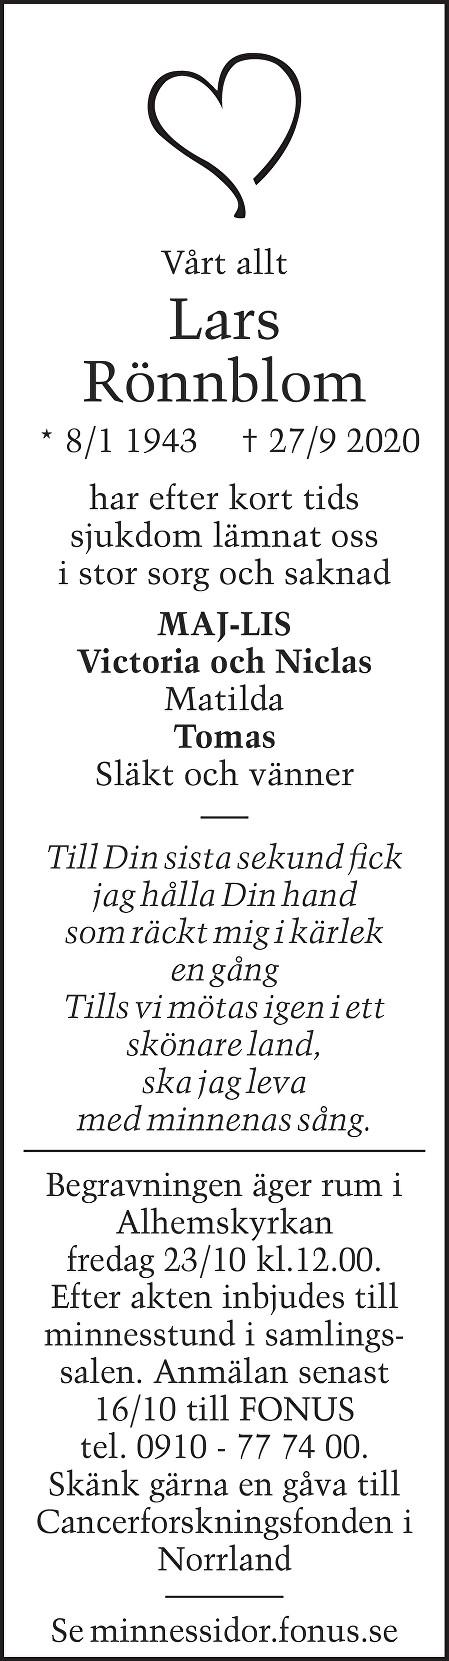 Lars Rönnblom Death notice